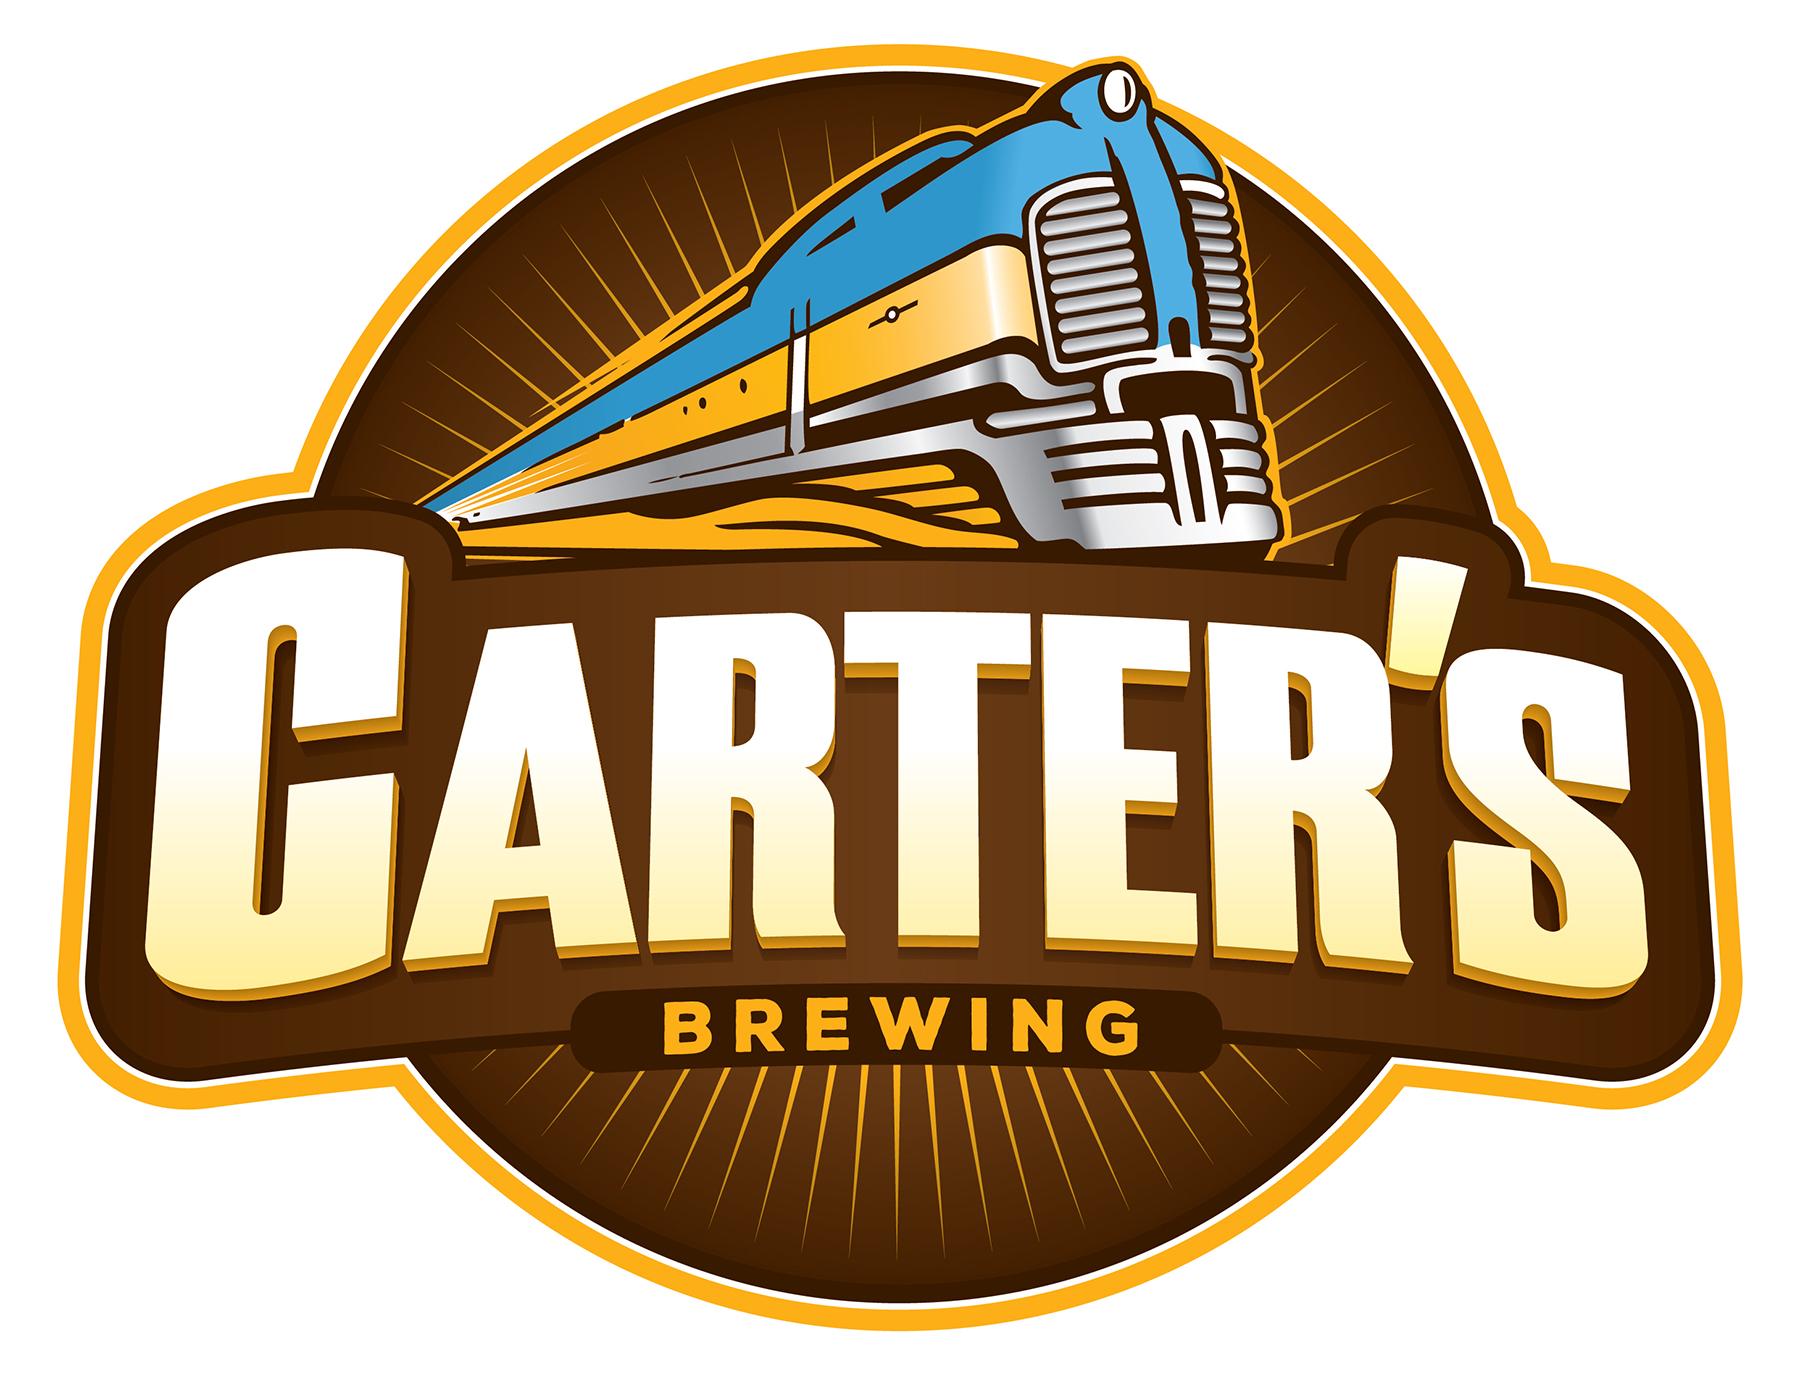 Carter's Brewing